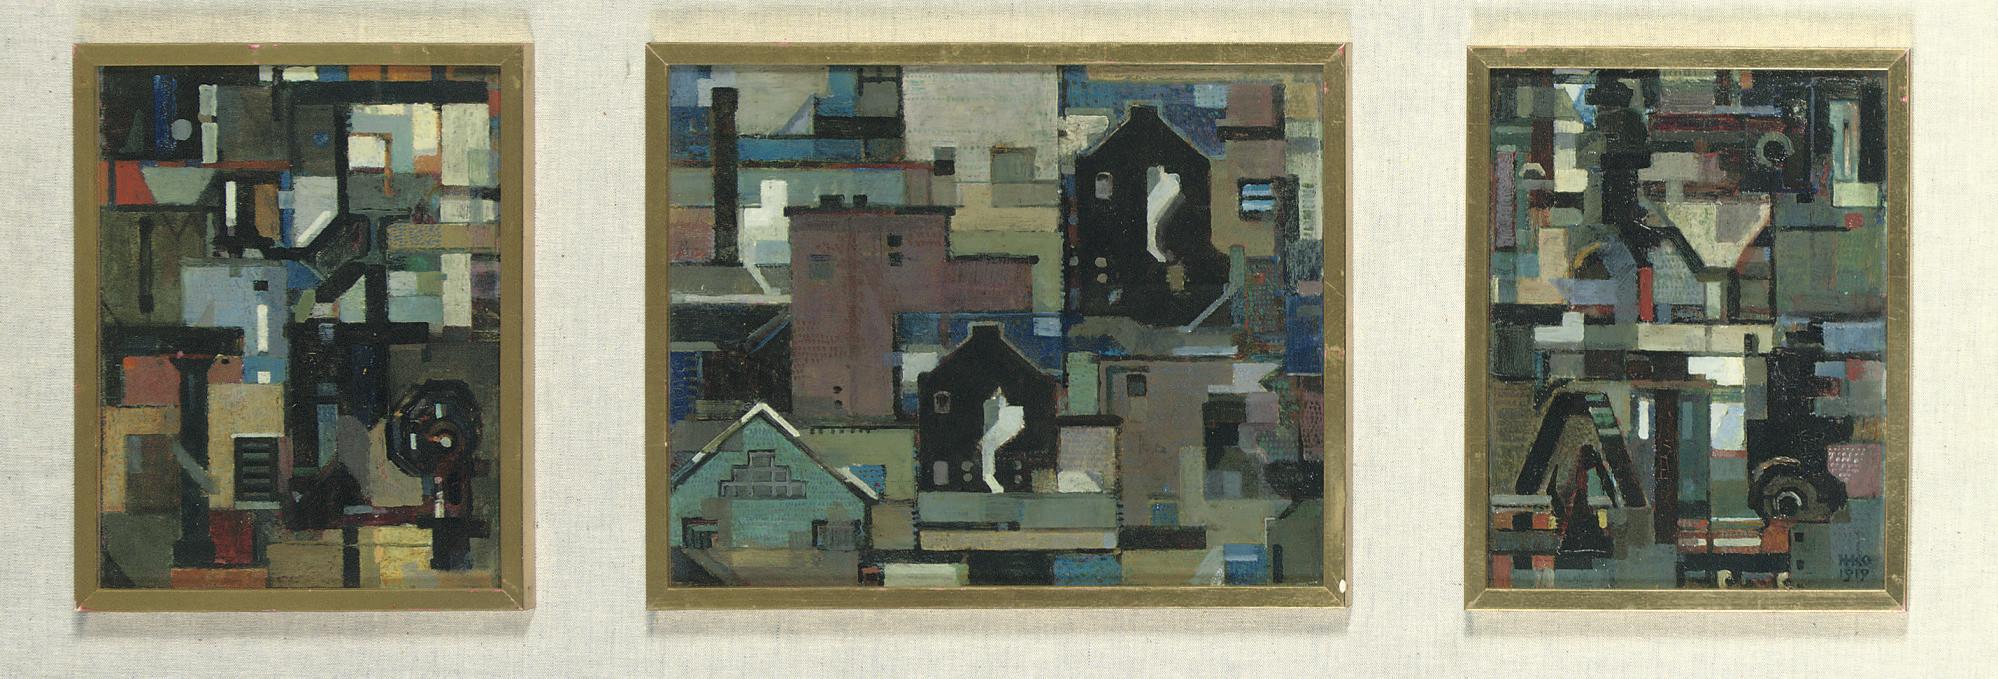 Delft (a triptych)